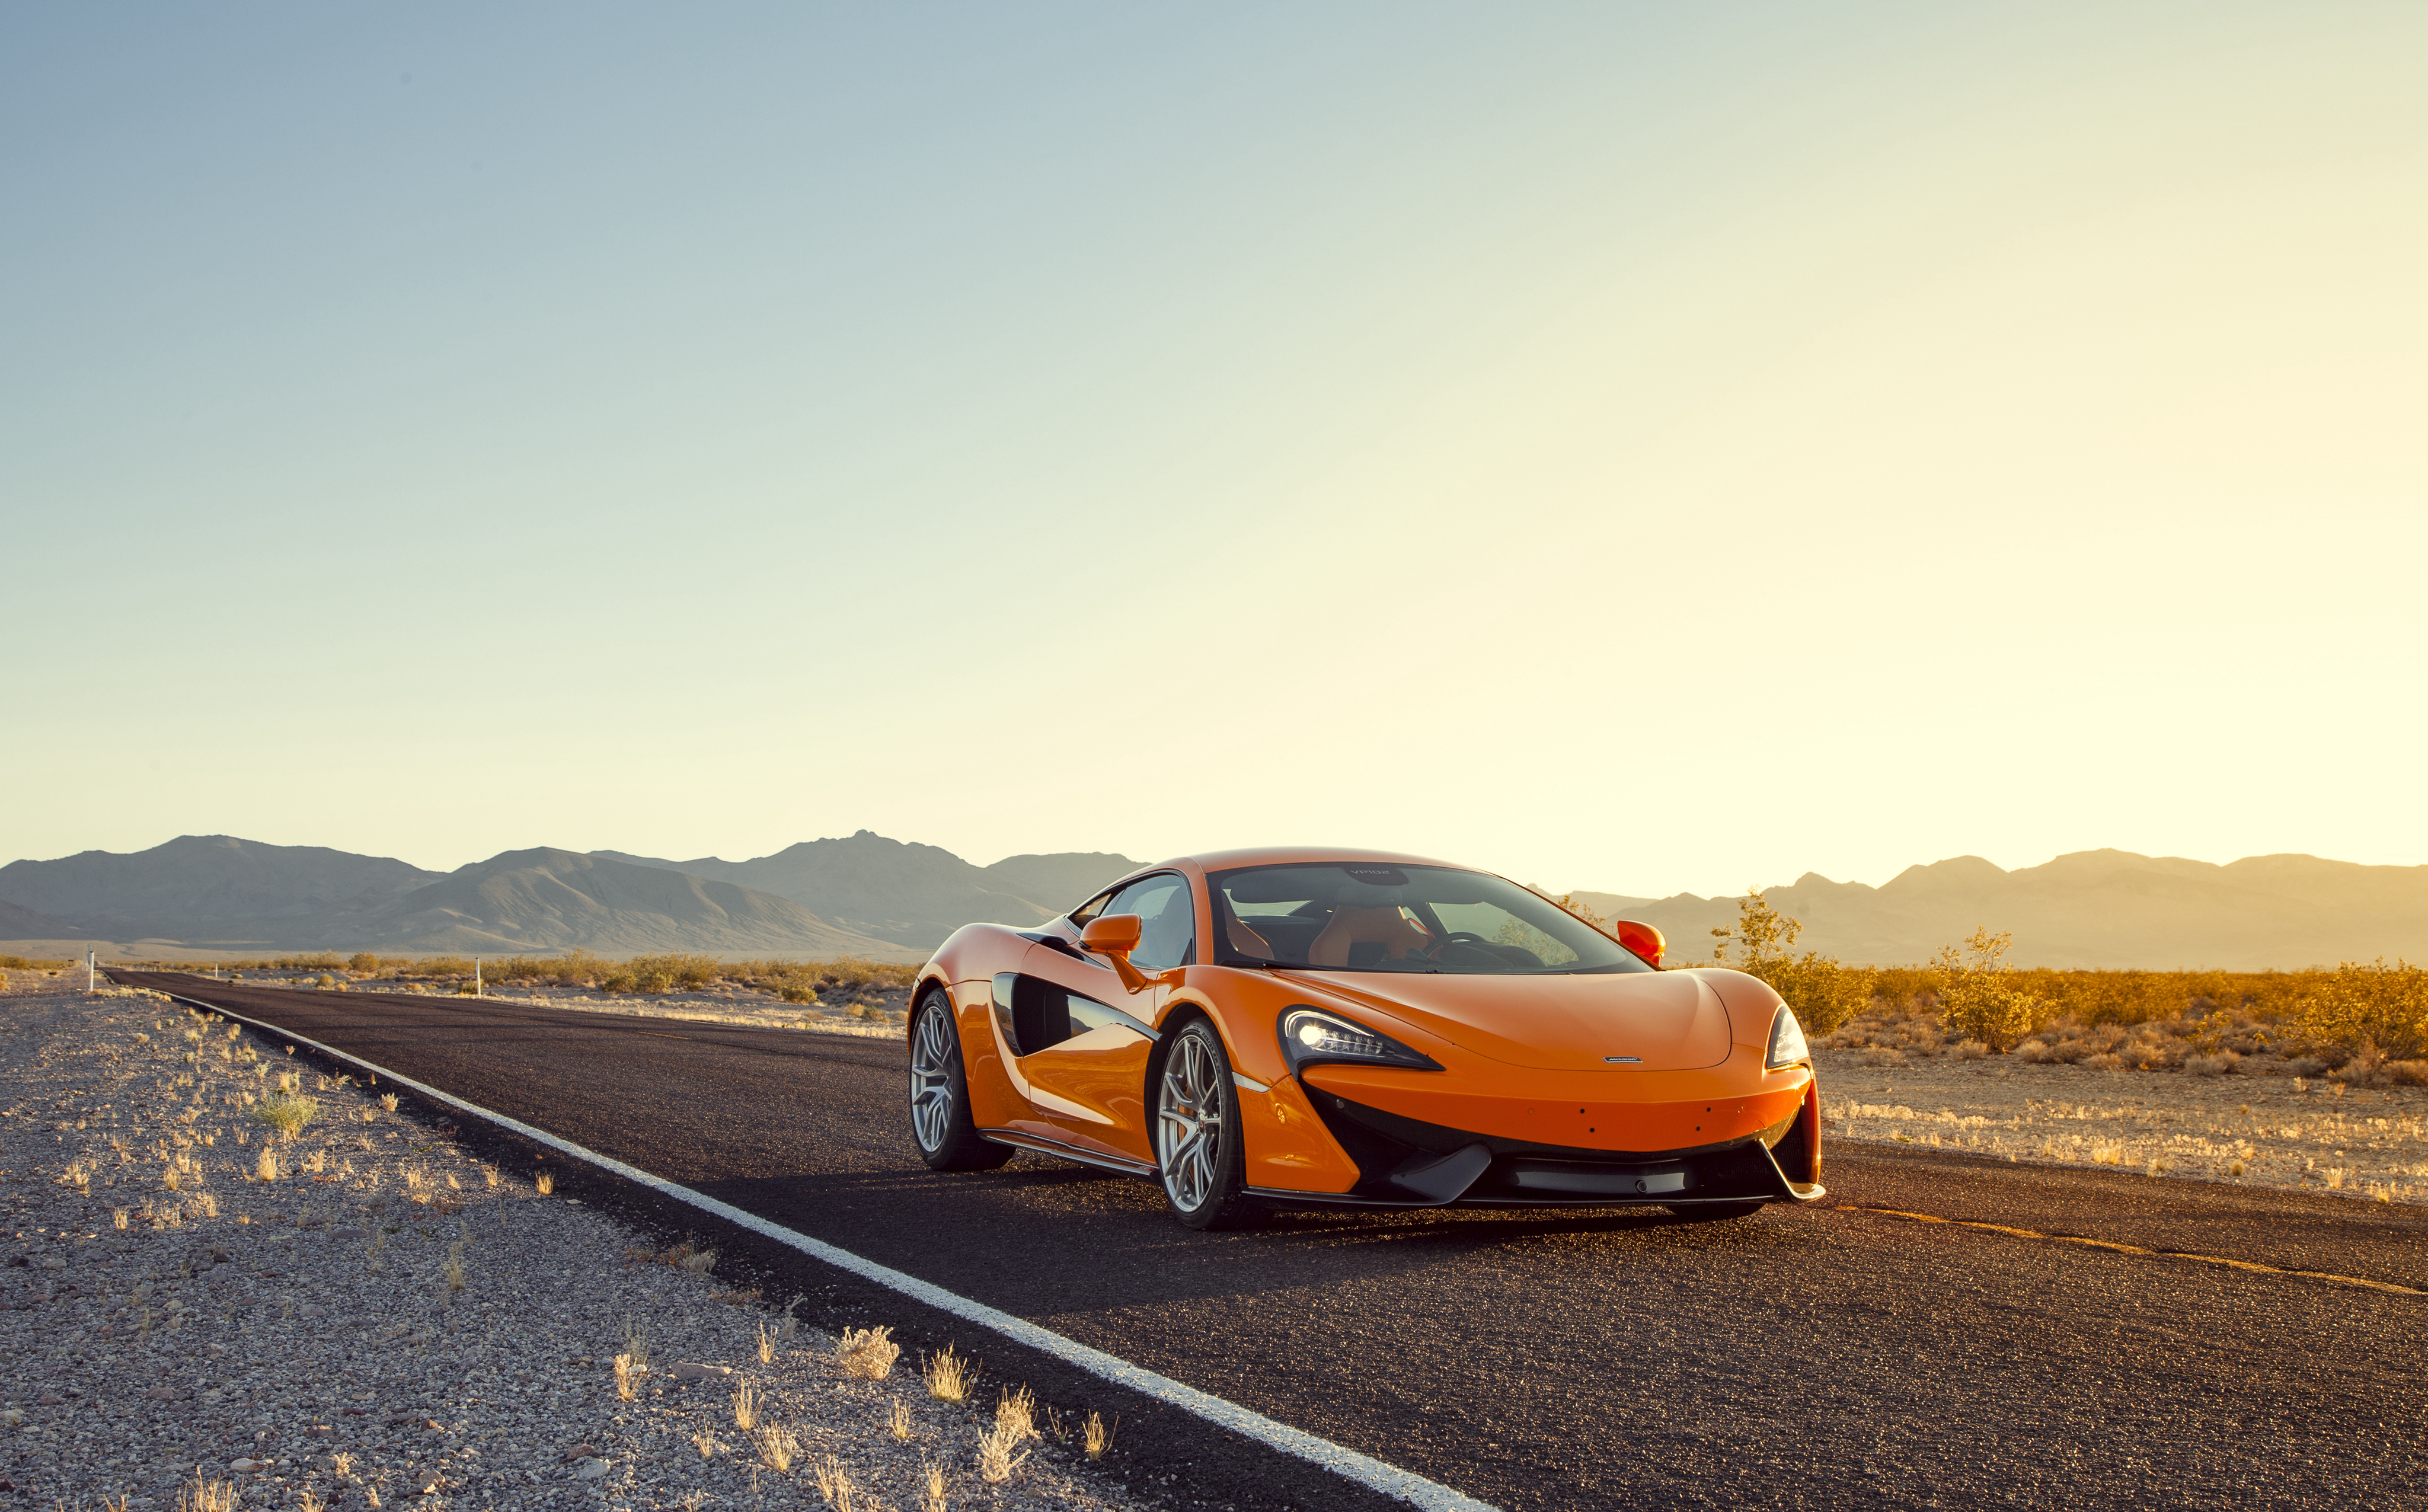 Mclaren 570S Sports Car, HD Cars, 4k Wallpapers, Images ...